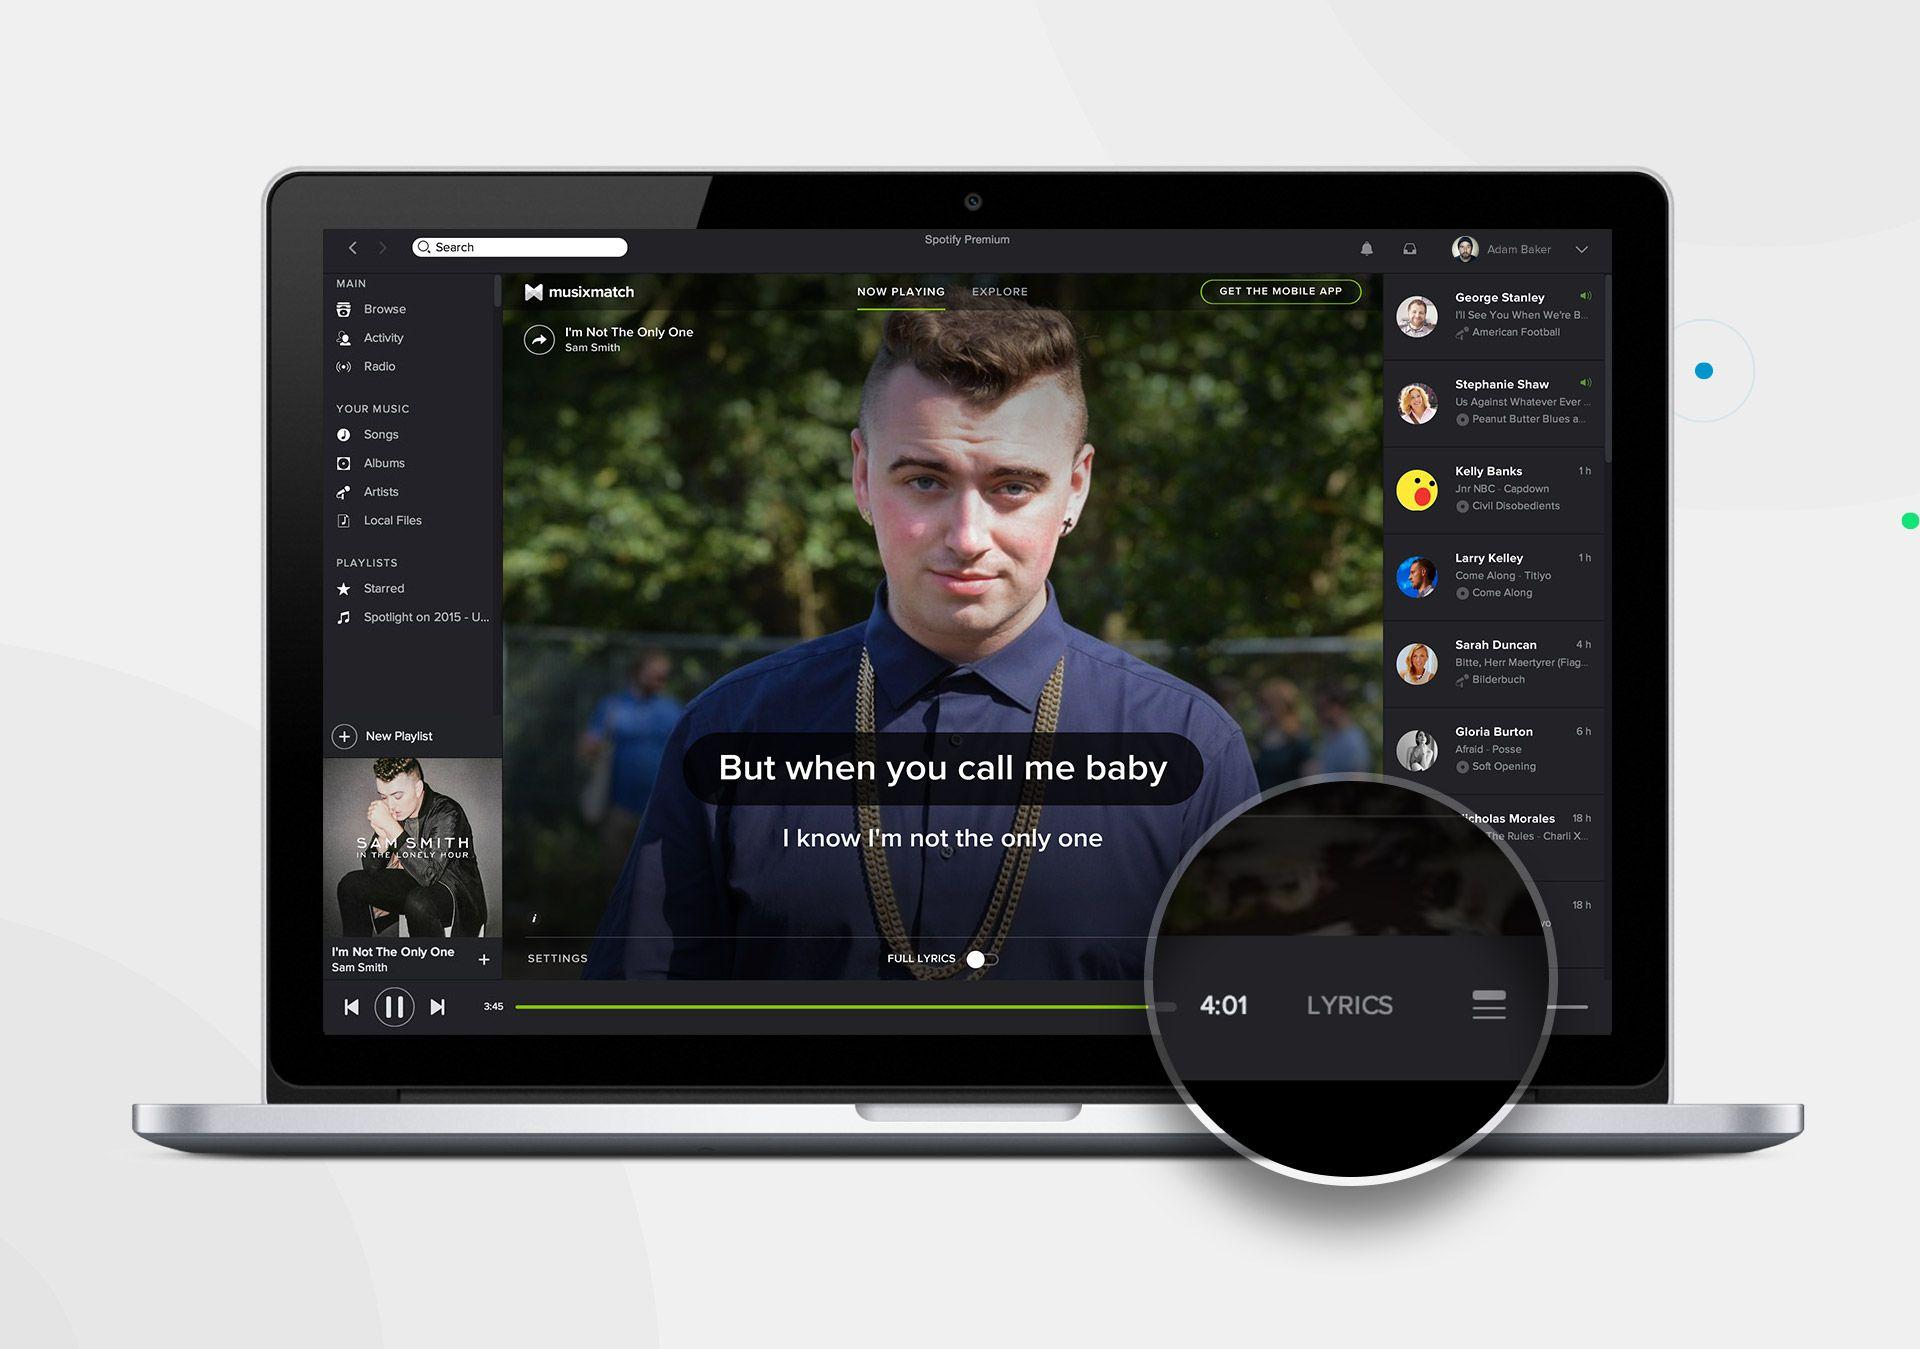 Introducing Musixmatch Lyrics Button on Spotify